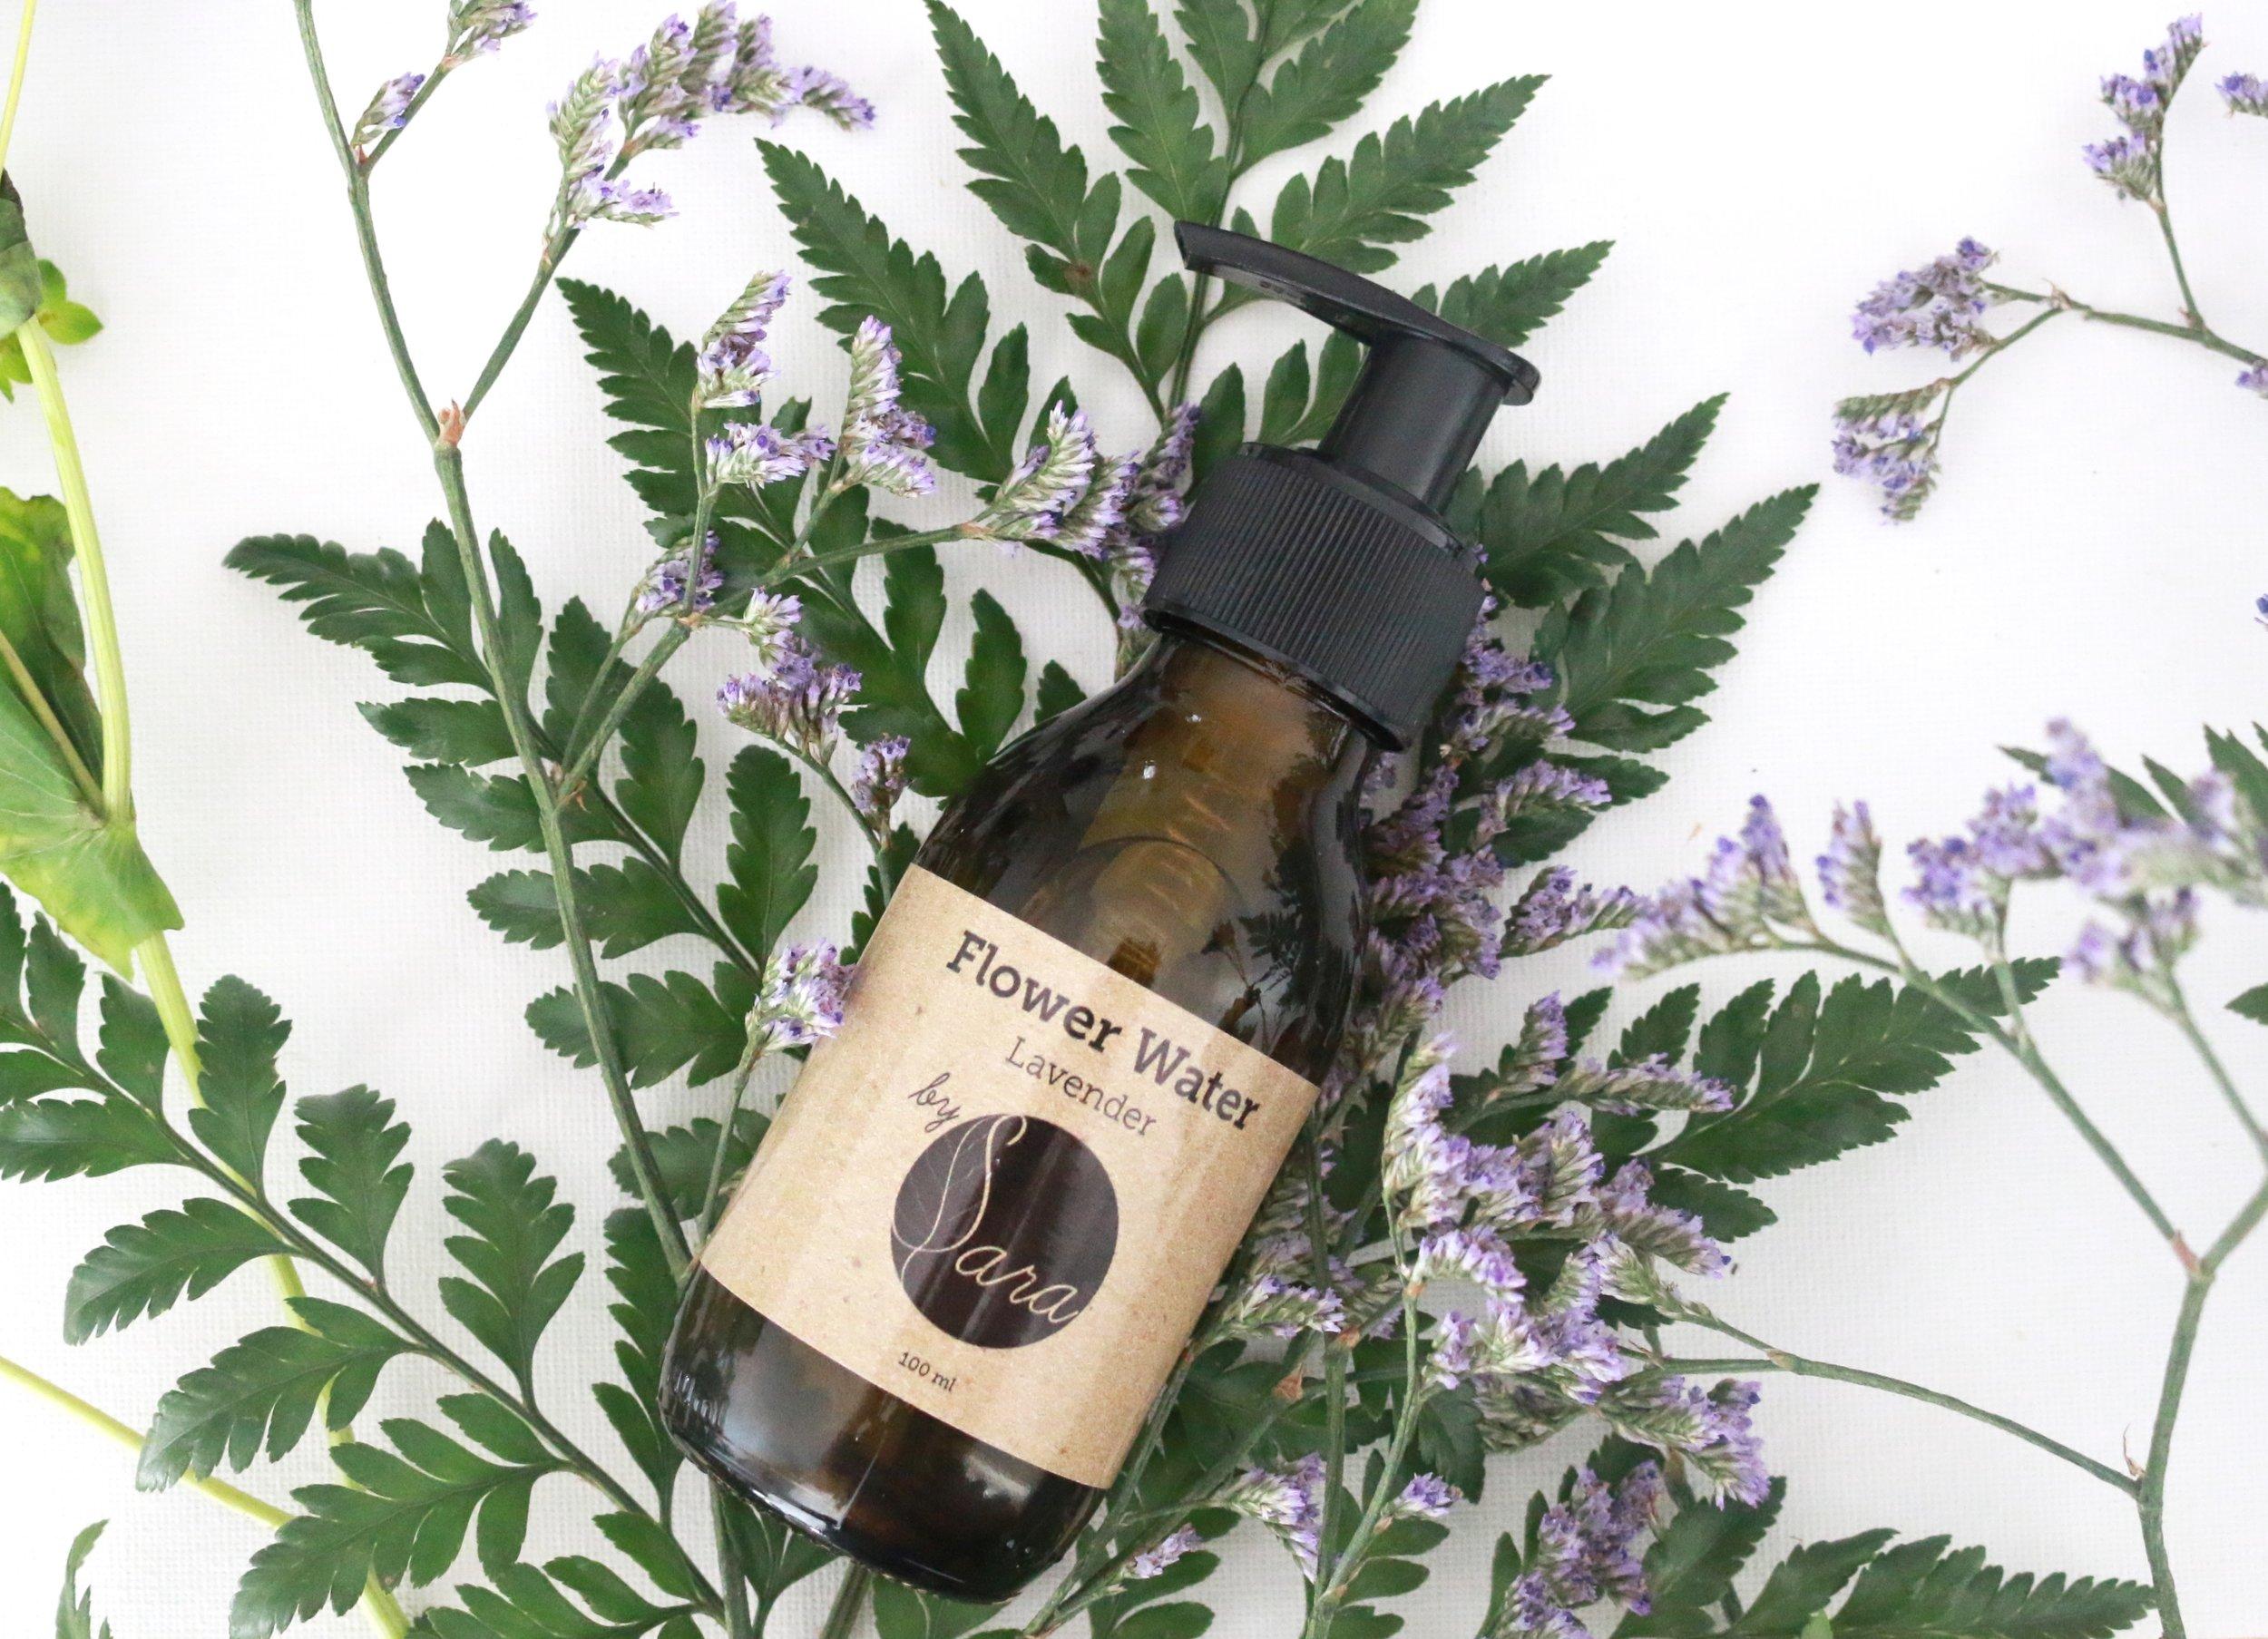 organics-by-sara-flower-water-lavender